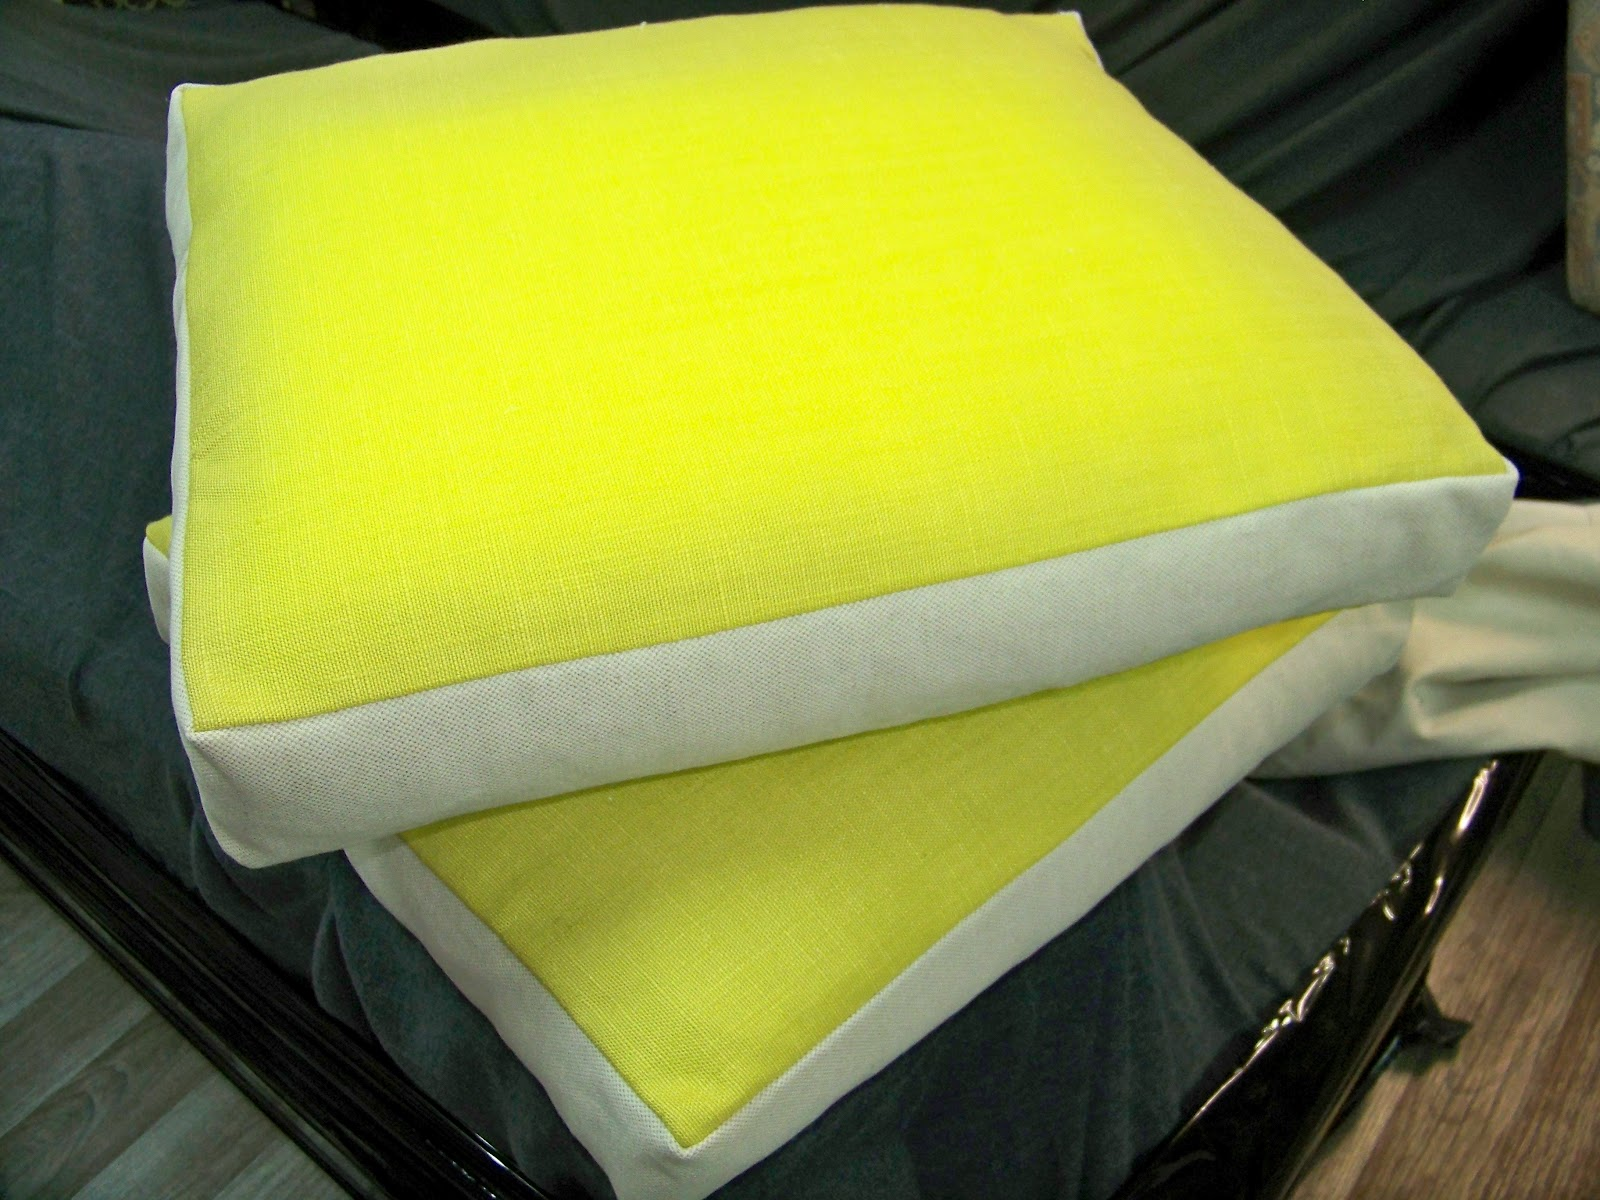 tapissier decorateur coussins. Black Bedroom Furniture Sets. Home Design Ideas